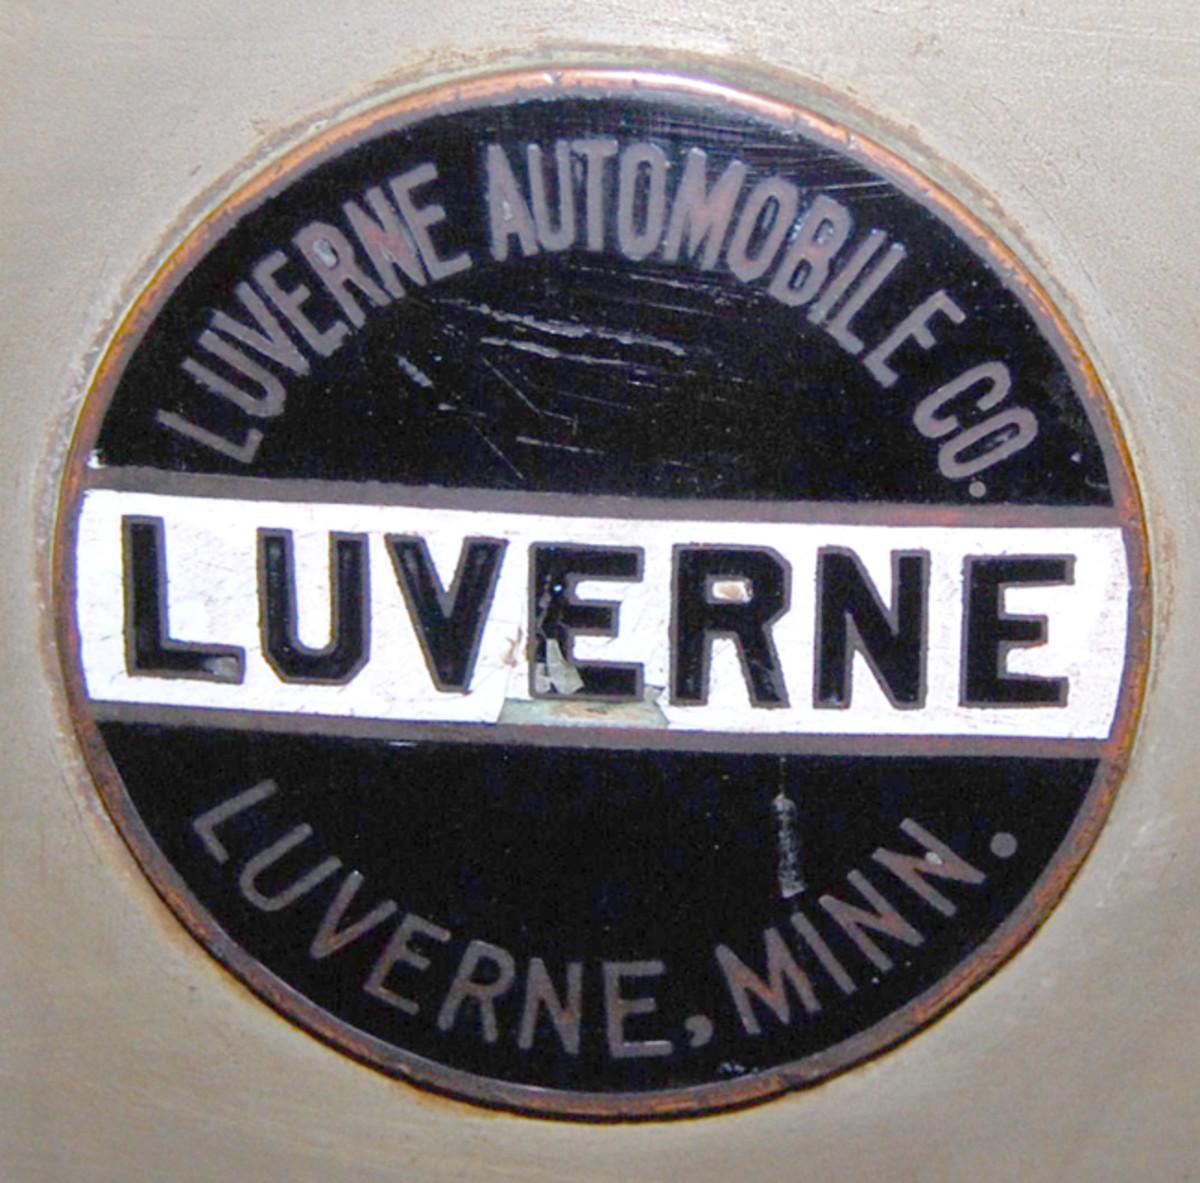 Radiator badge from John Kelsey's Big Brown Luverne Six touring car.